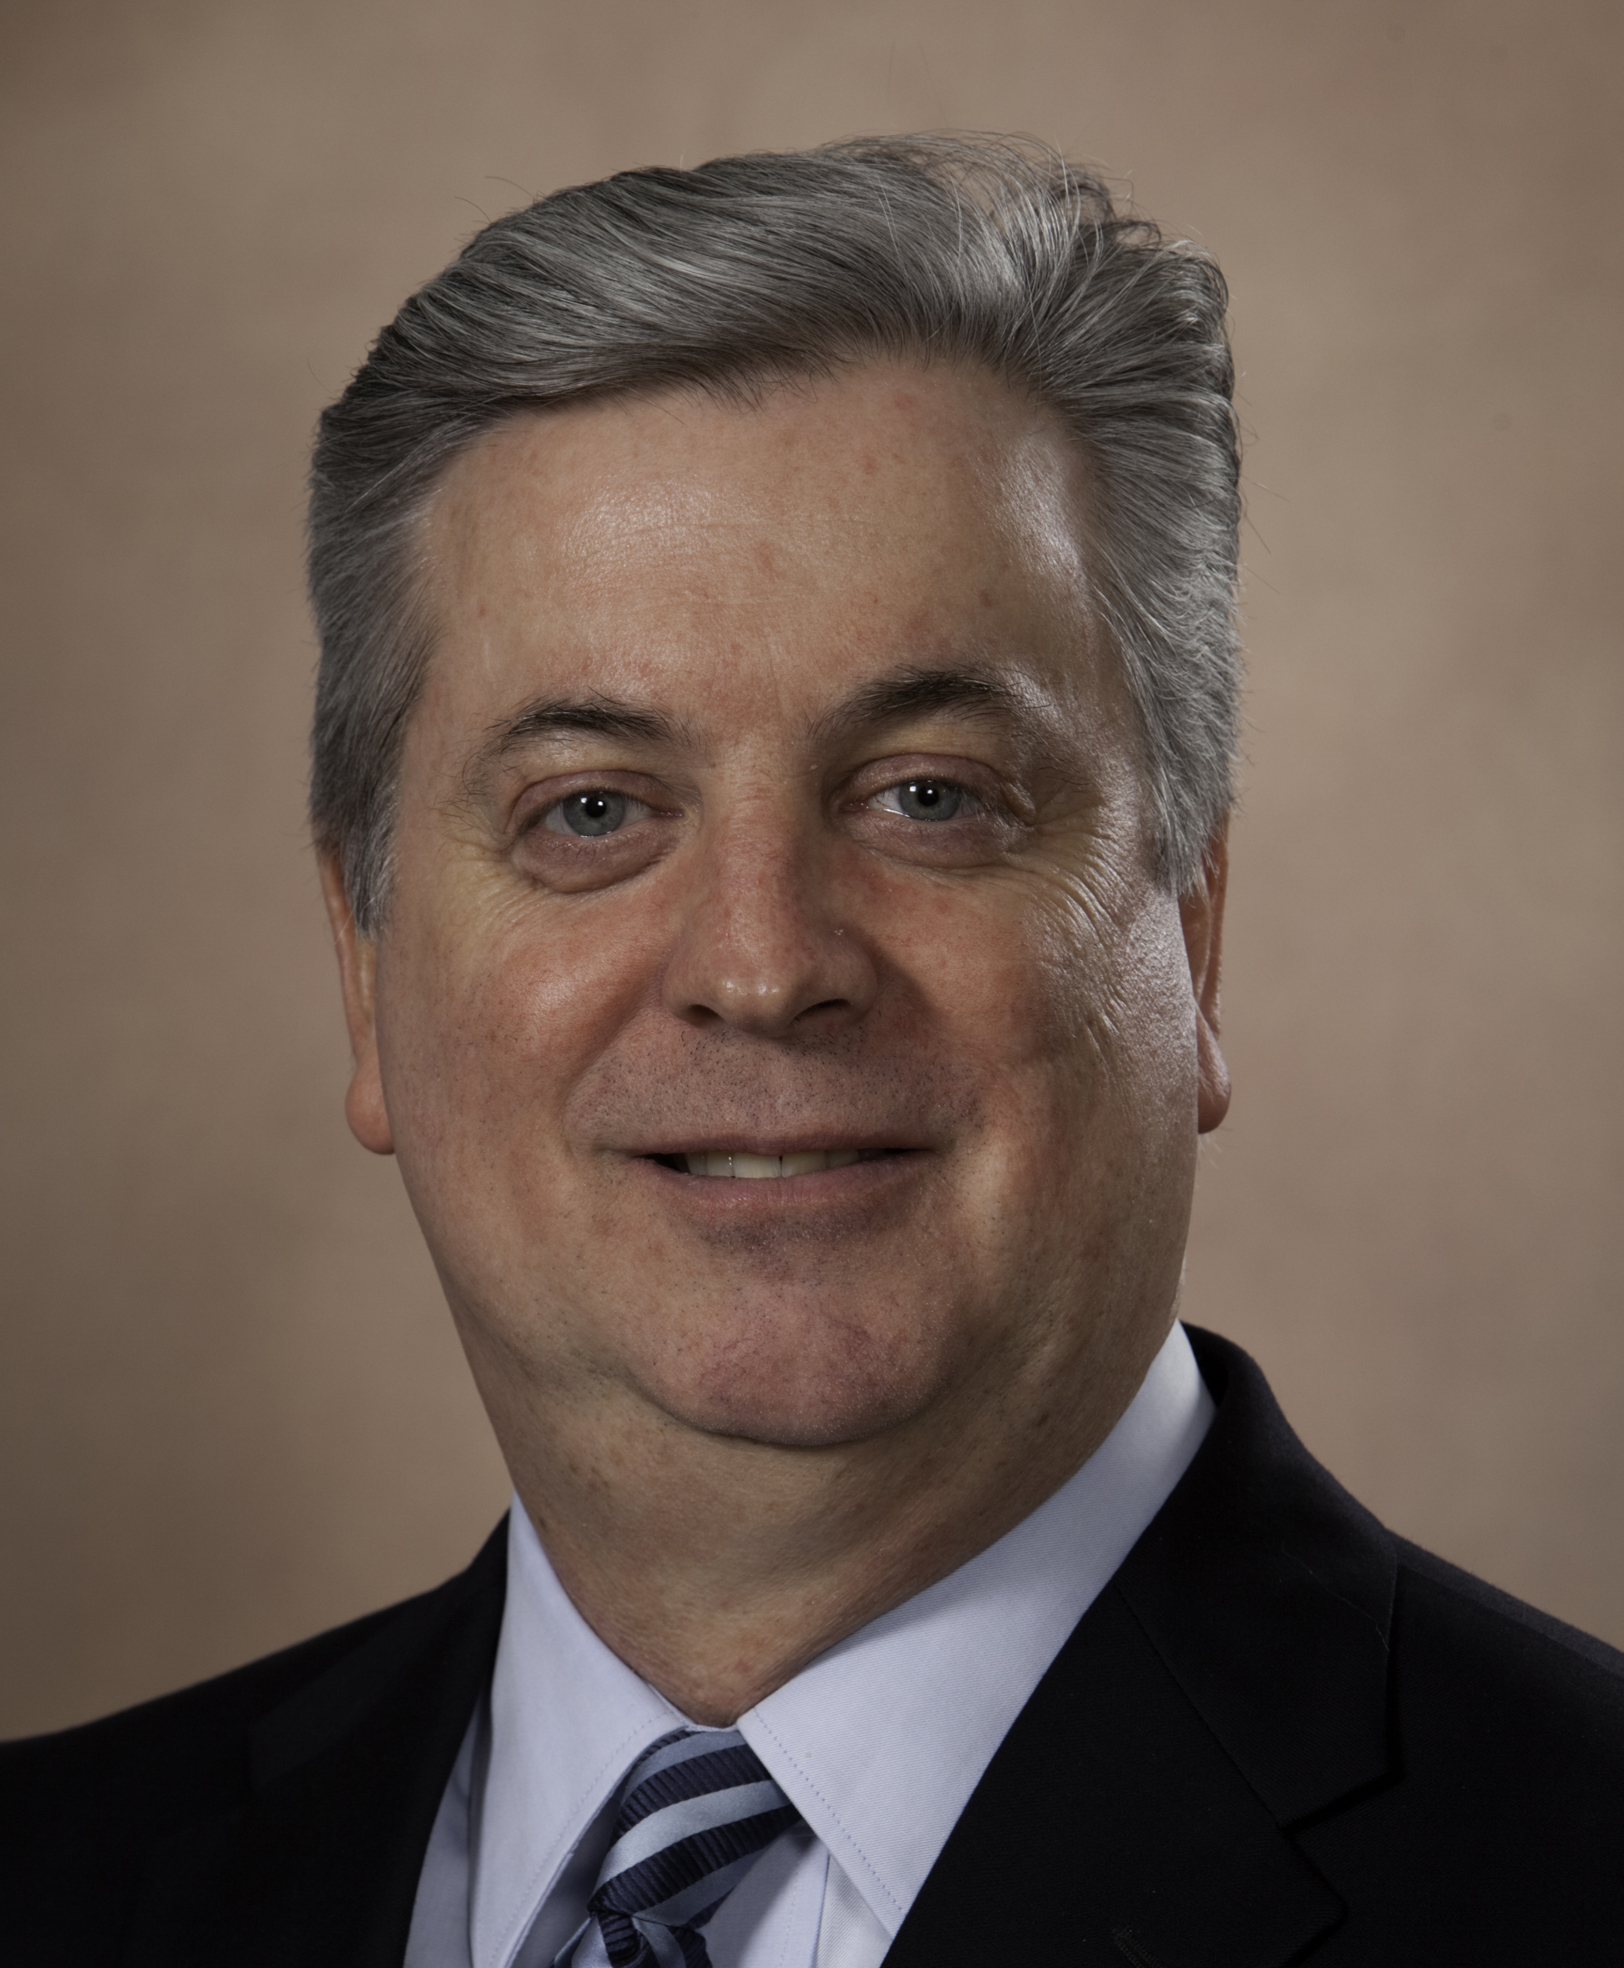 Tom Costello